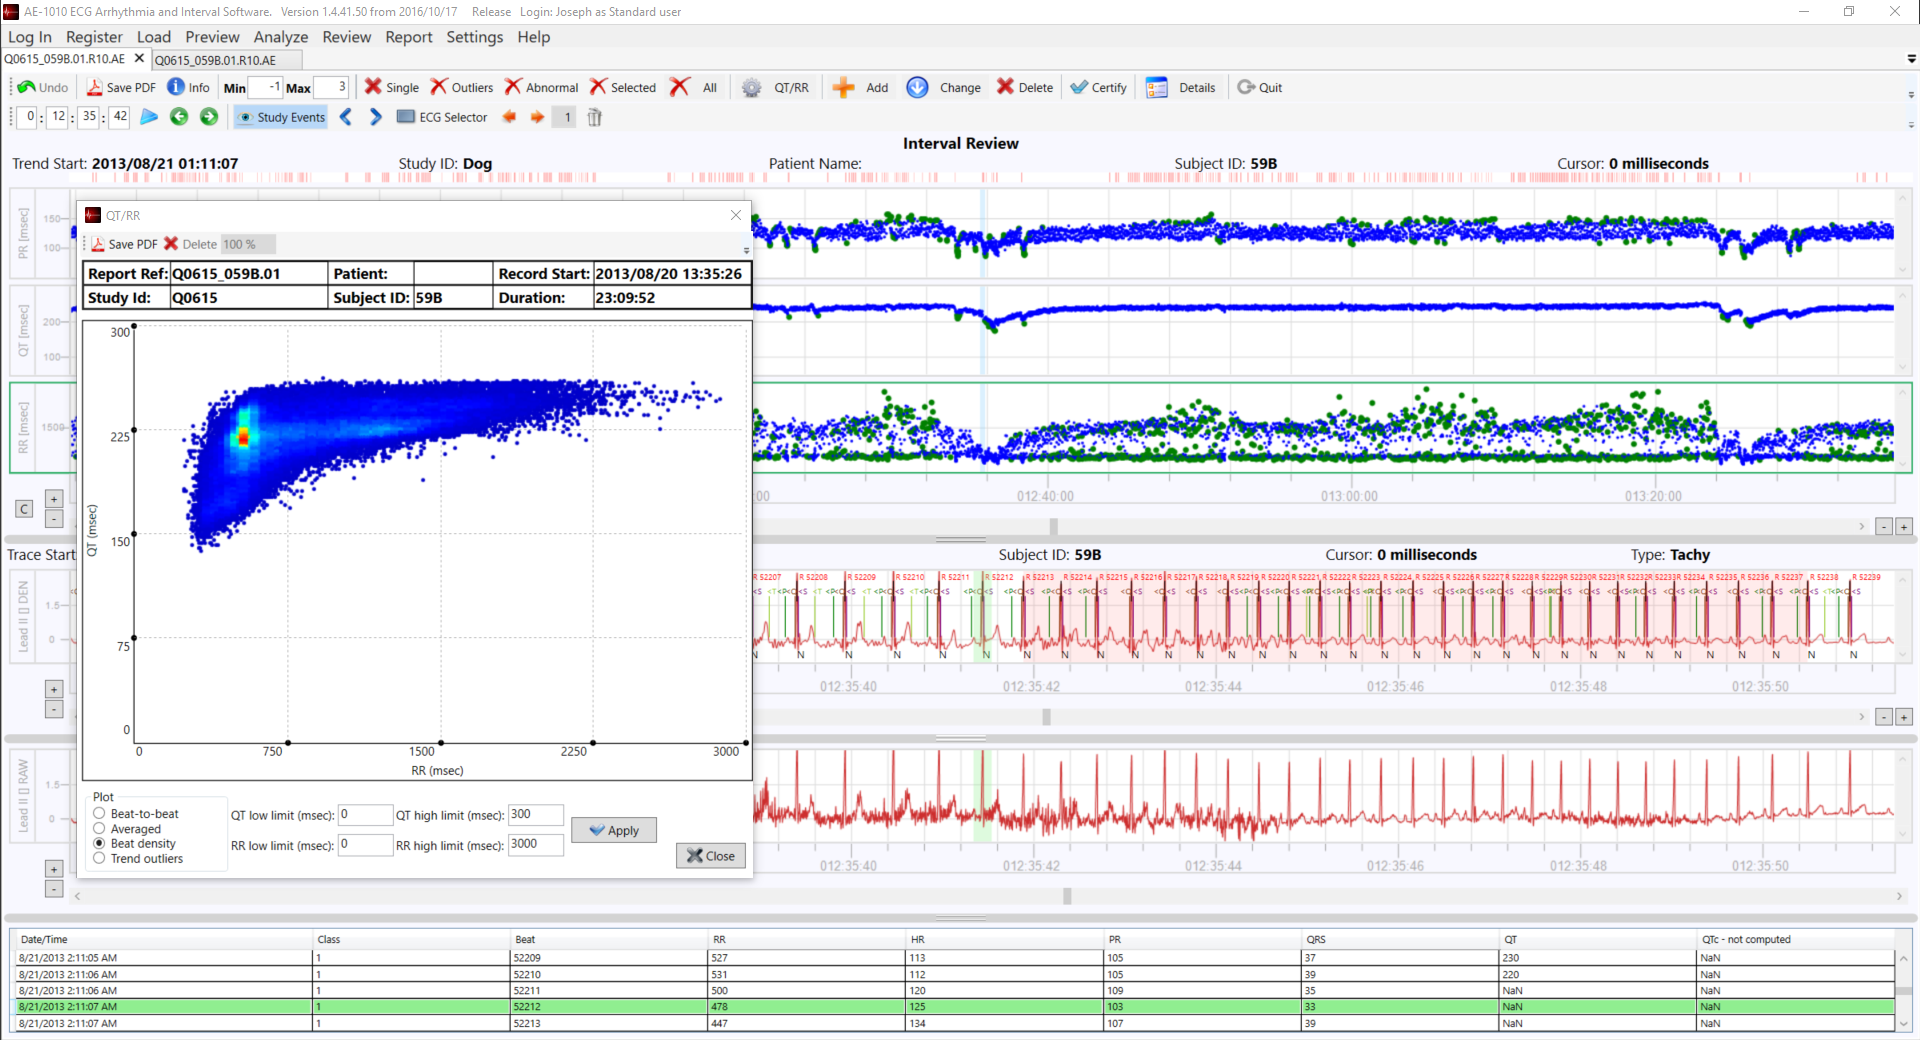 VivaQuant - ECG Analysis Software